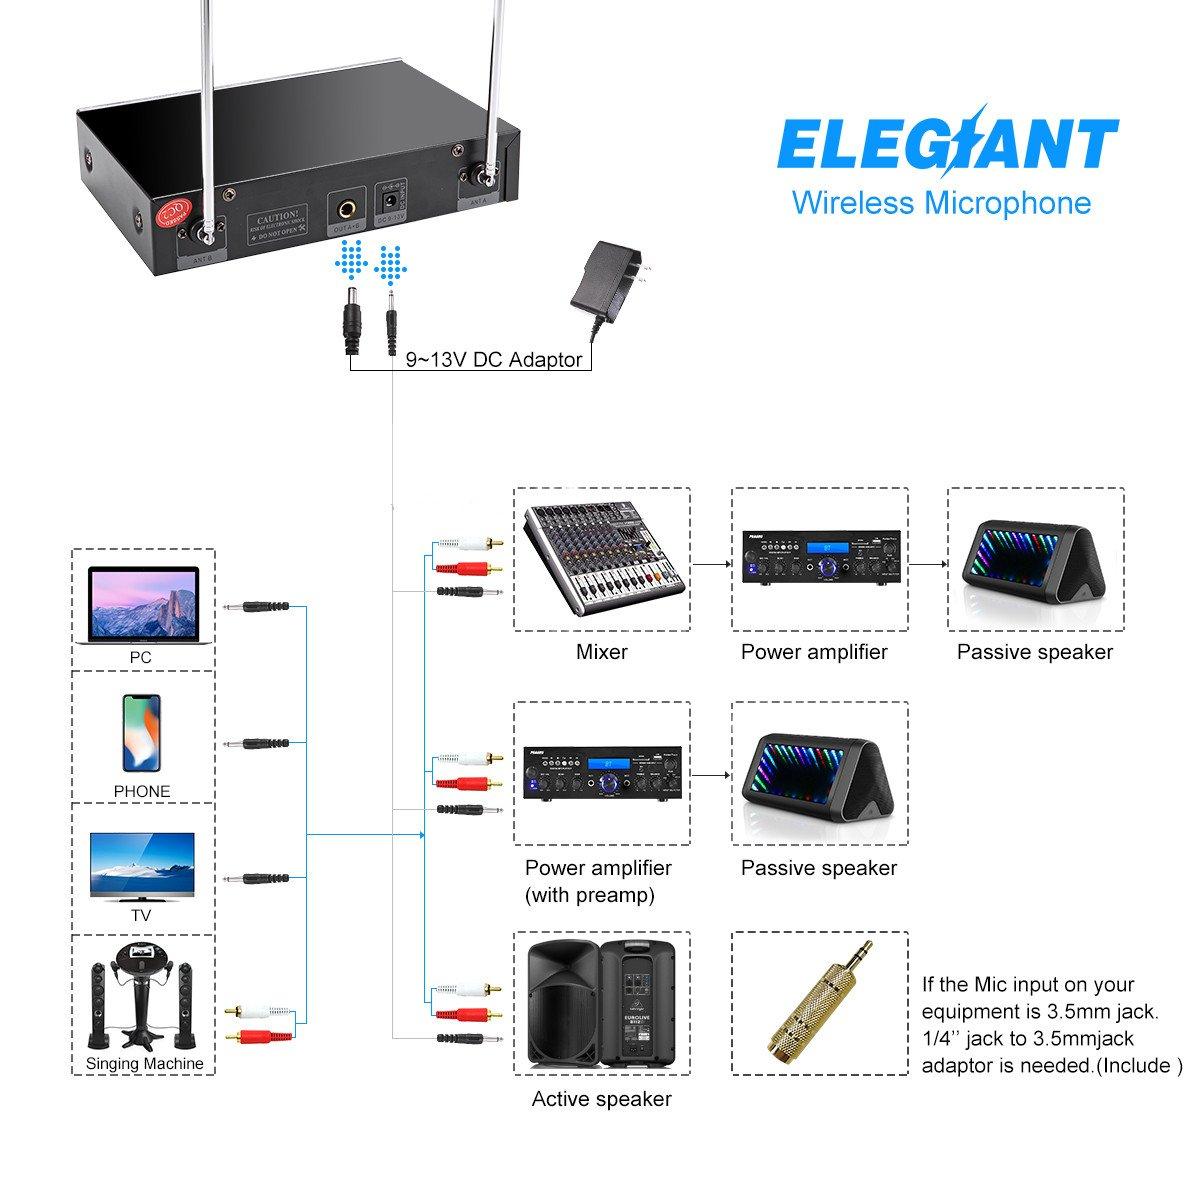 Uhf Wireless Microphone System Elegiant Dual Channel Handheld Hifi Mic Karaoke Speaker Sing A Song Microphones Receiver Metal Professional Singing Machine For Speech